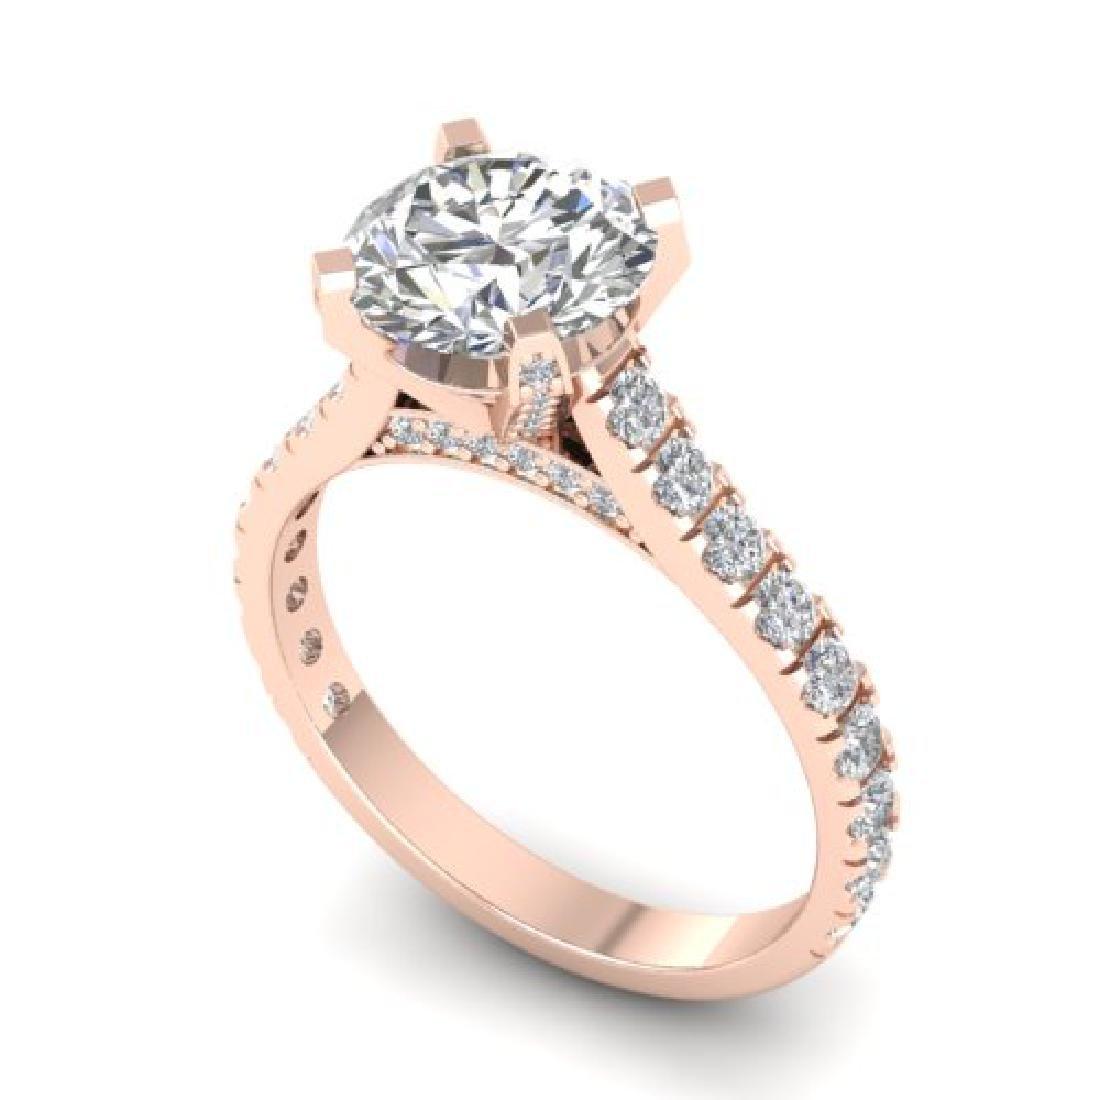 2.4 CTW Certified VS/SI Diamond Solitaire Art Deco Ring - 2